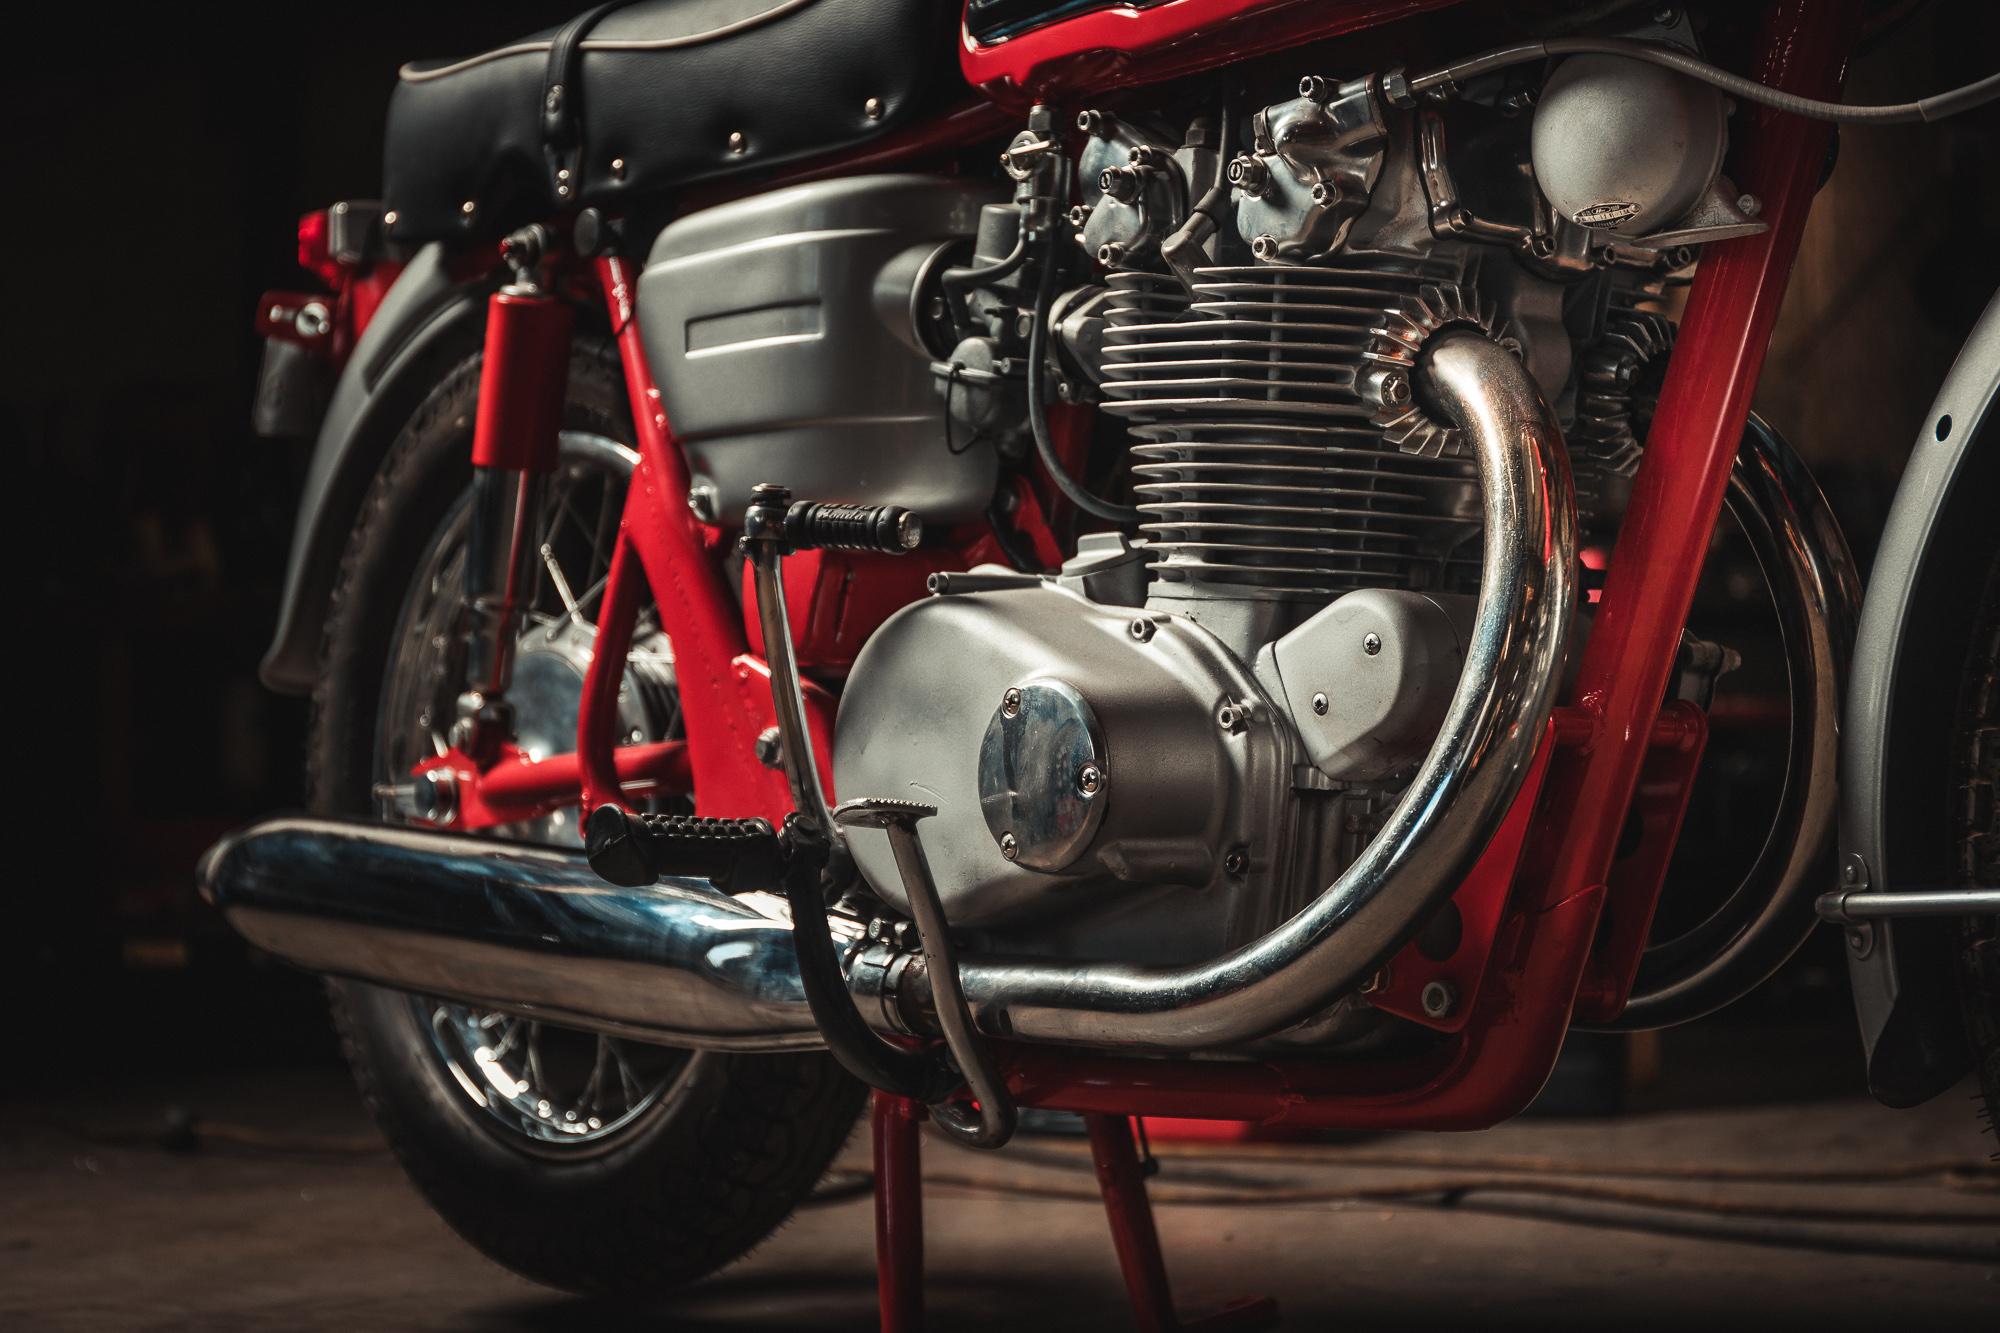 2019-08-19_Rathbone_Motorworks_Tech_Gloves_0194.jpg